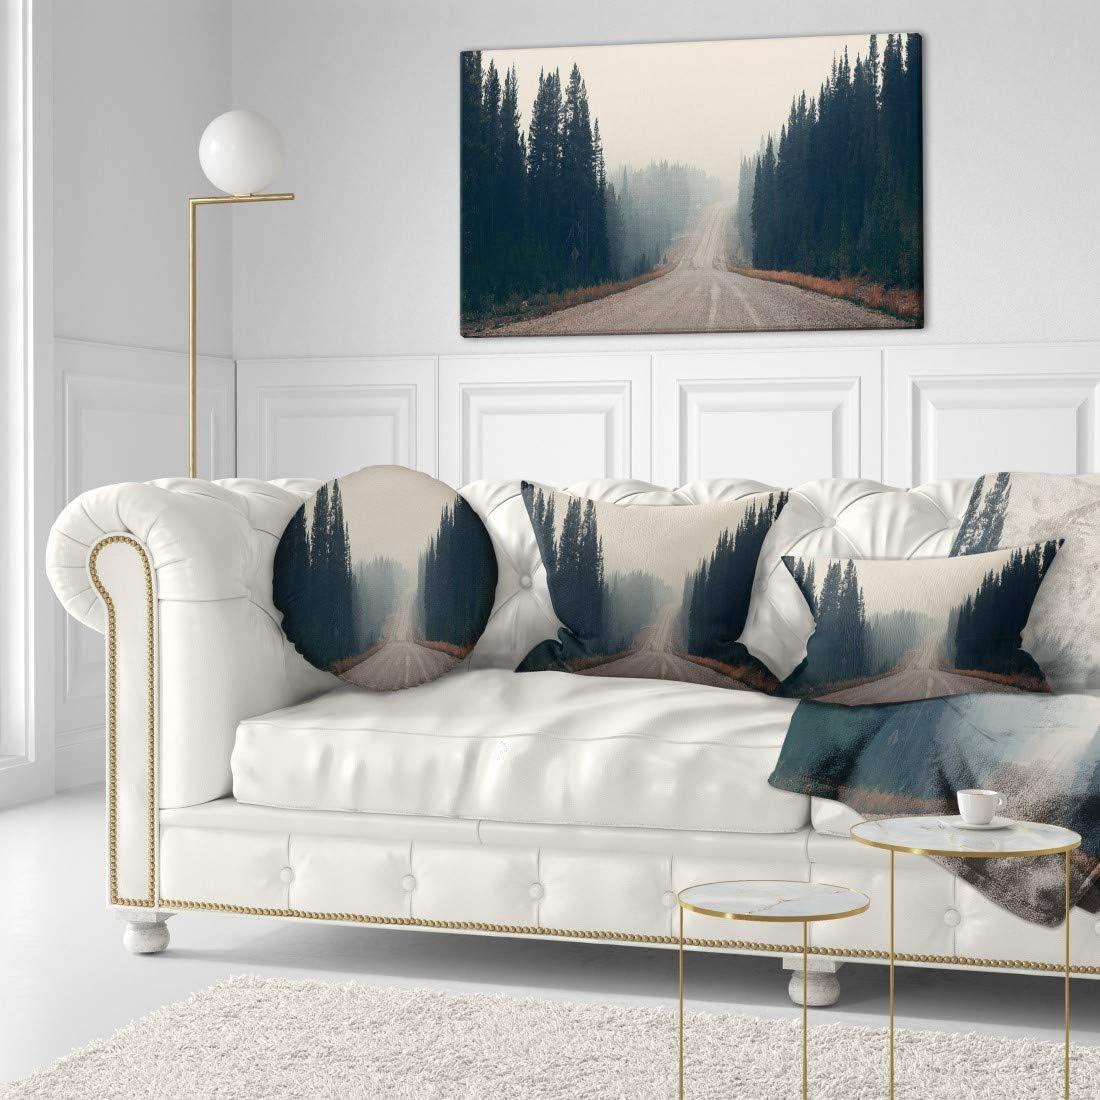 Design Art 奉呈 PT11546-40-20 Foggy Road Park-Mode Forest お気に入 in Banff